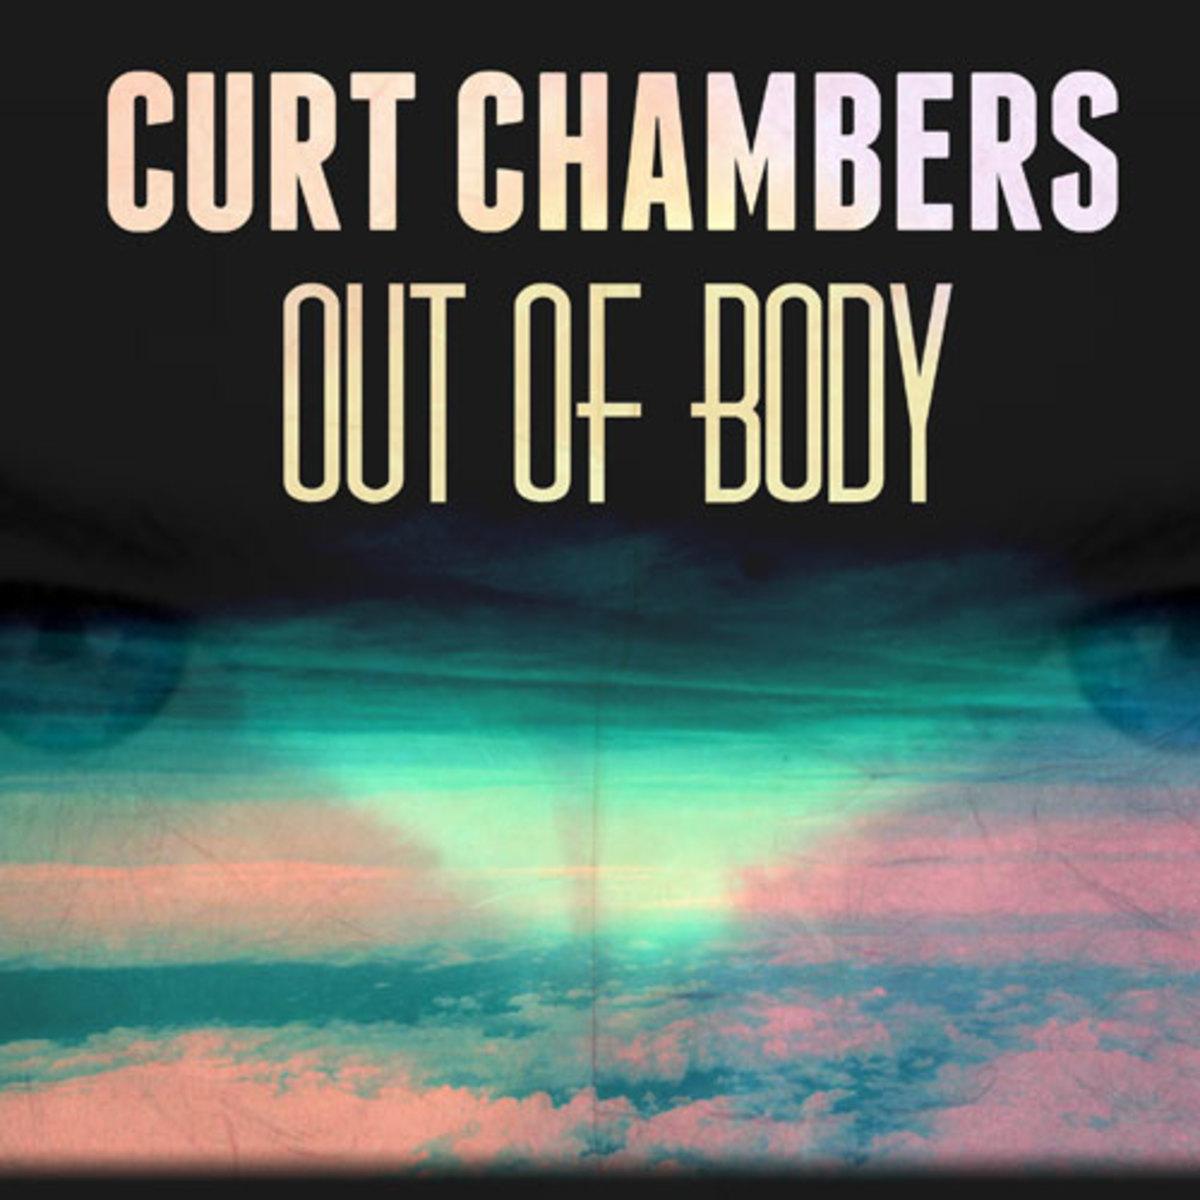 curtchambers-outofbody.jpg